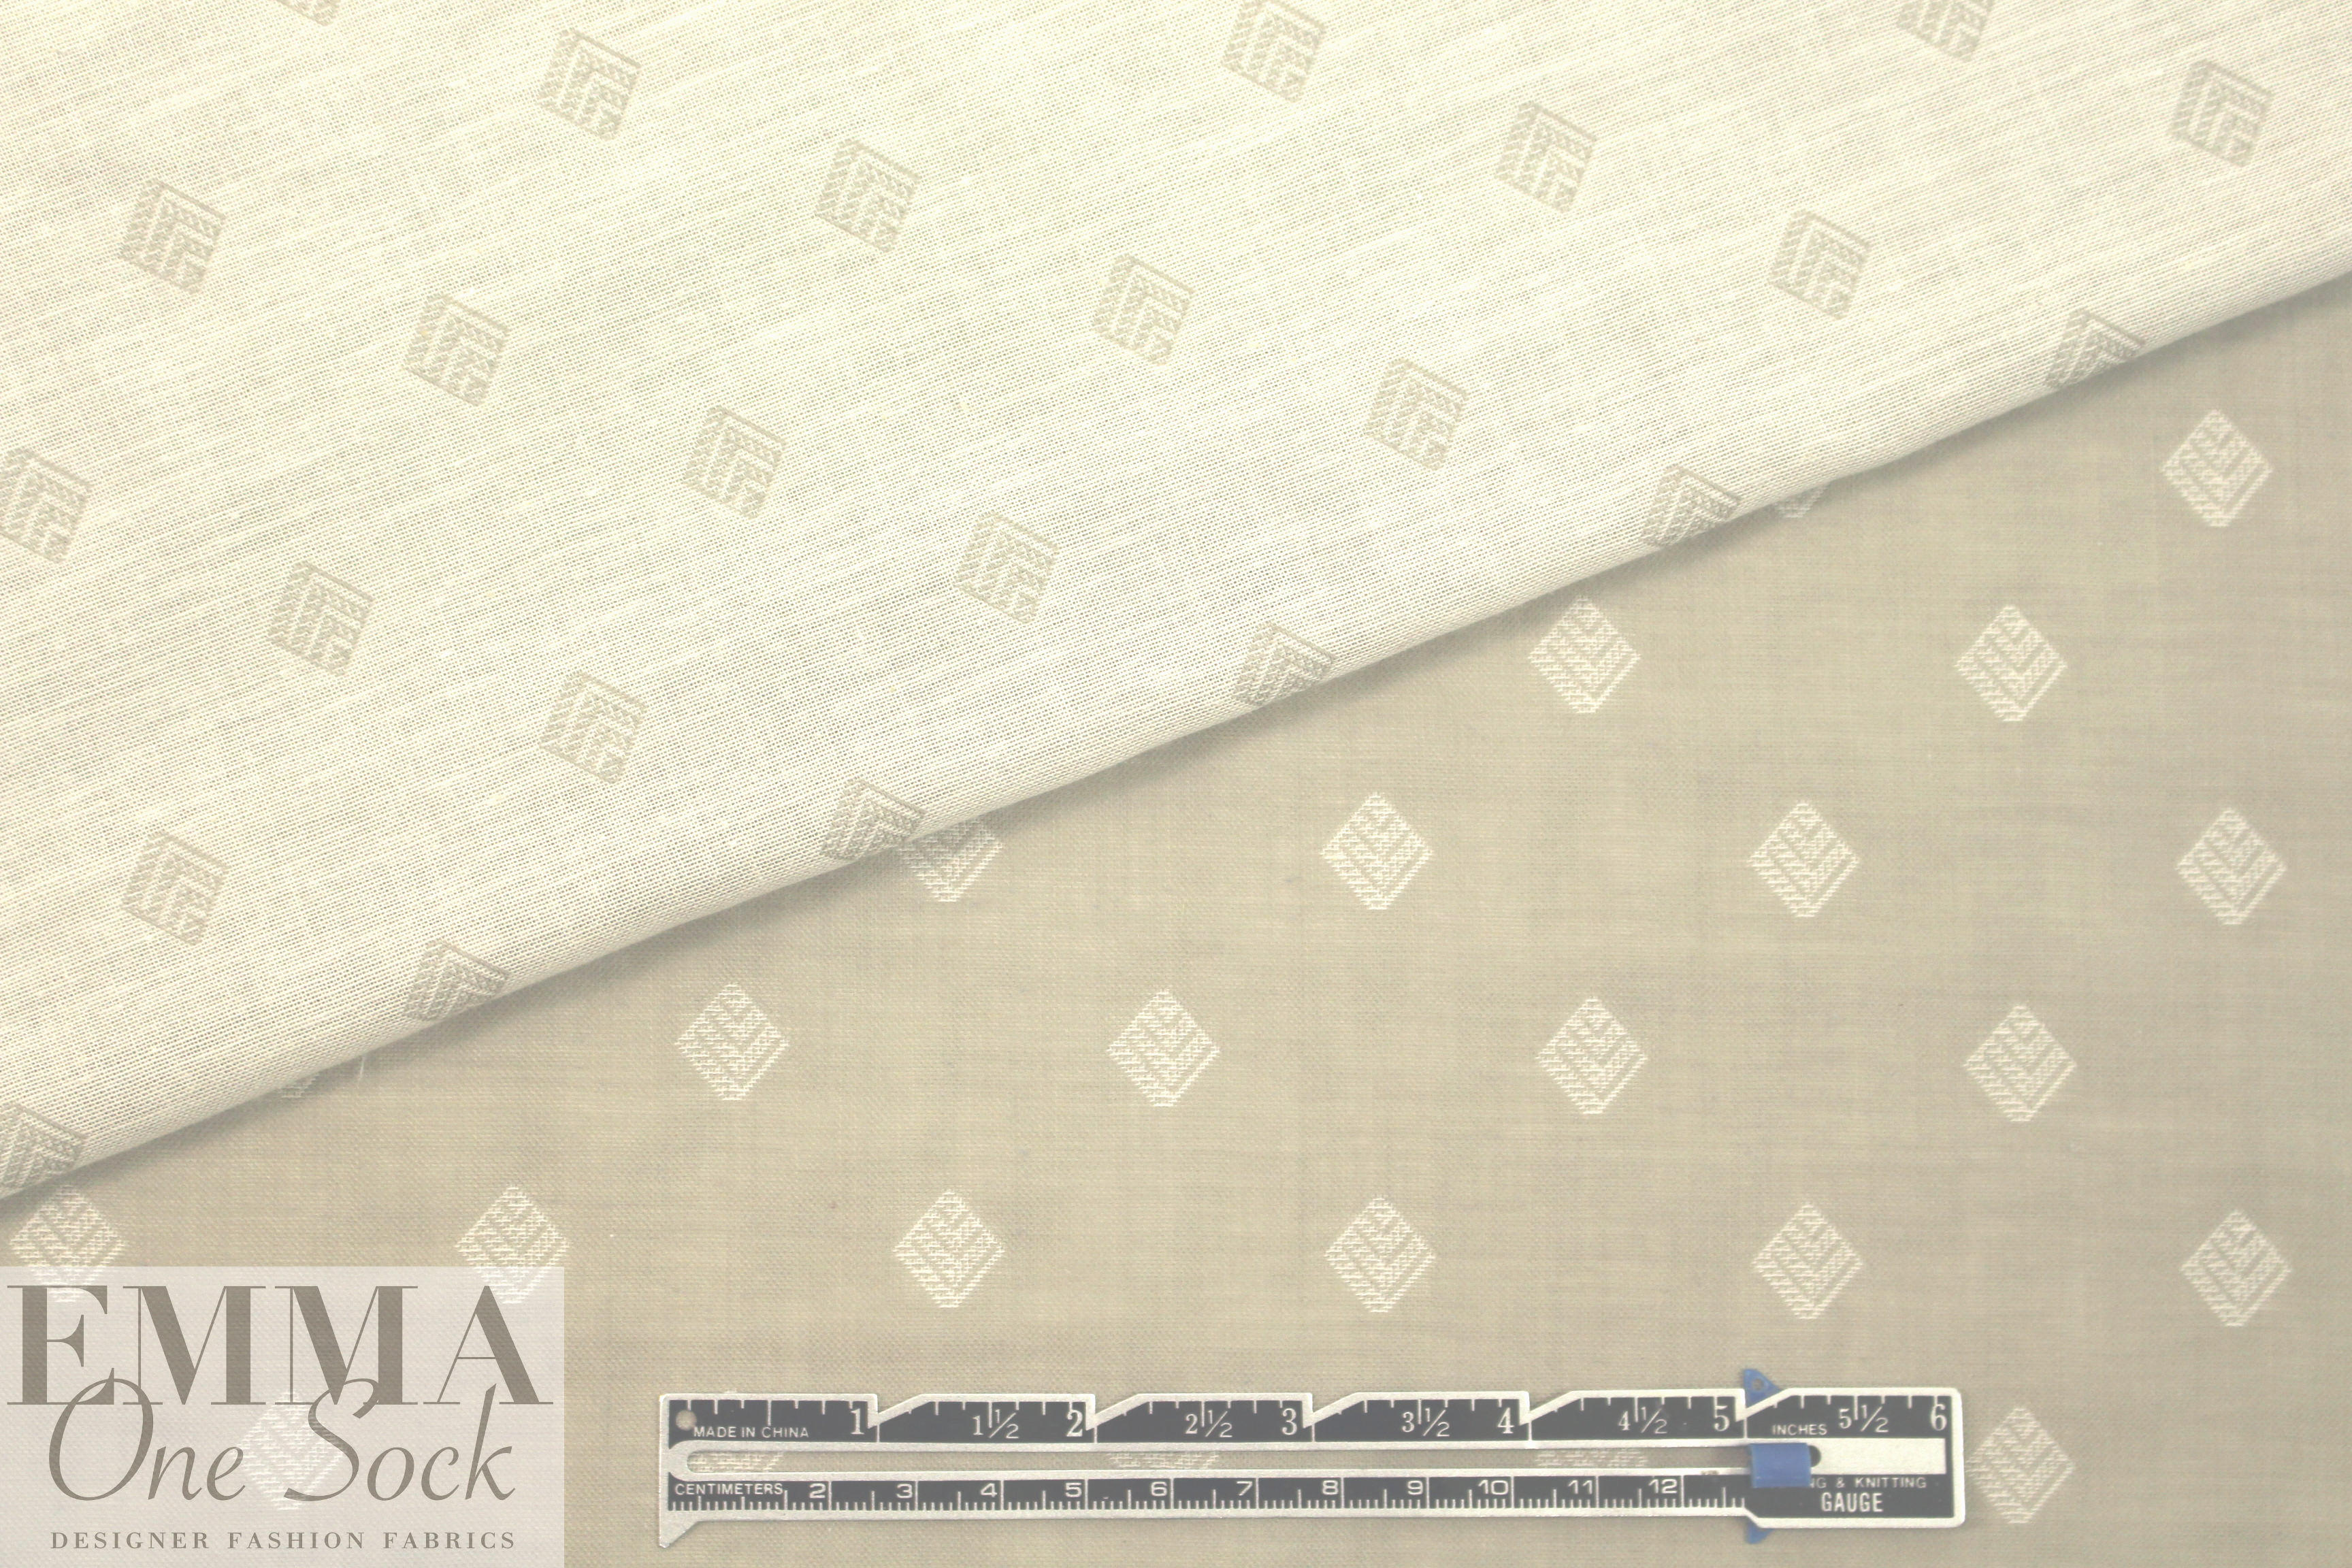 05737f793aa7bb Italian cotton 2-ply jacquard woven - khaki from EmmaOneSock.com